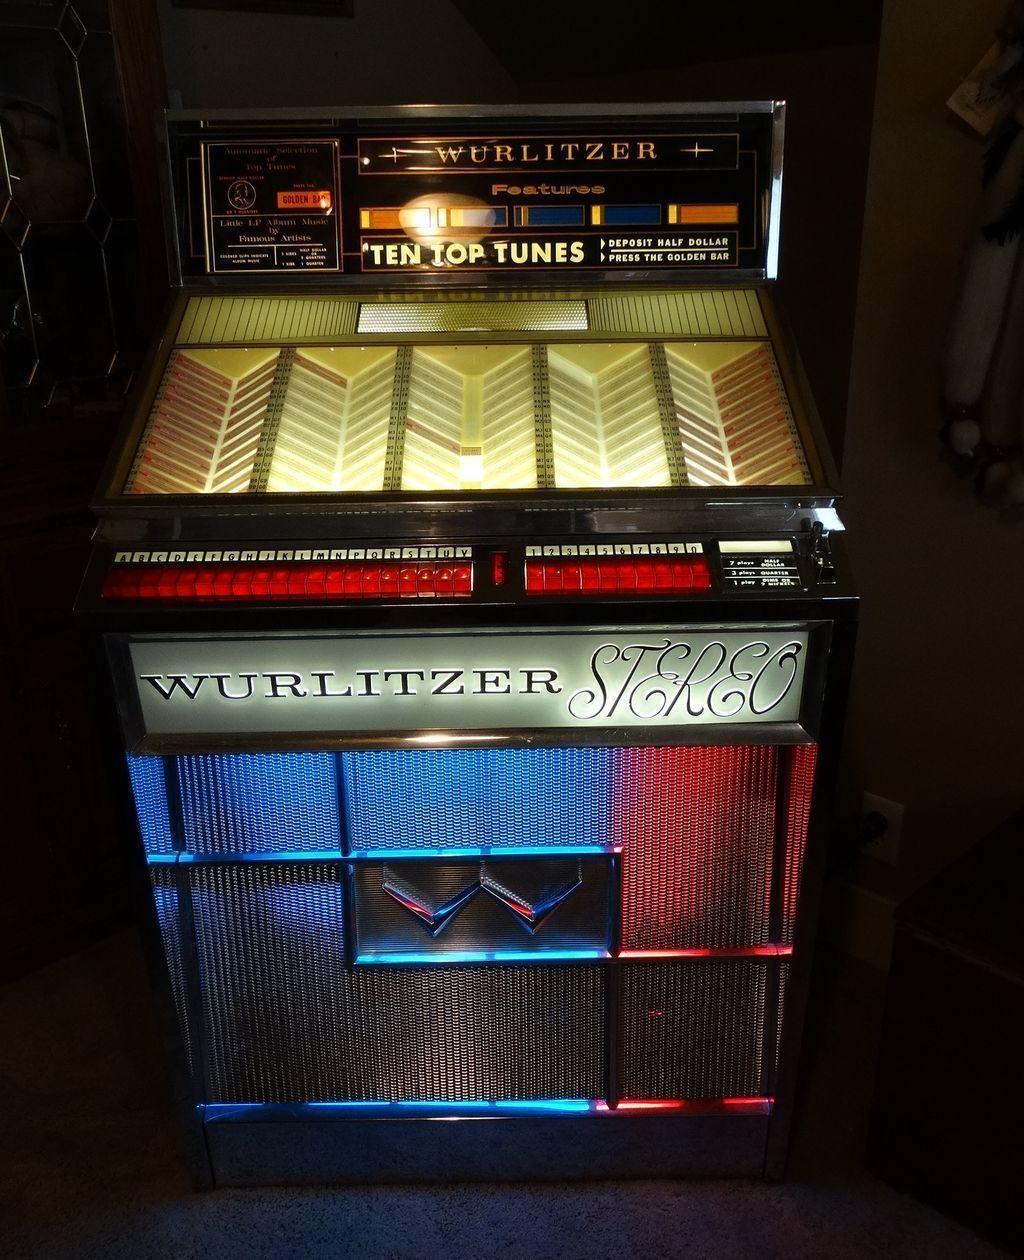 1963 Wurlitzer Jukebox Model 2700 Multi Selector Early Stereo Phonograph Professionally Restored Juke Box